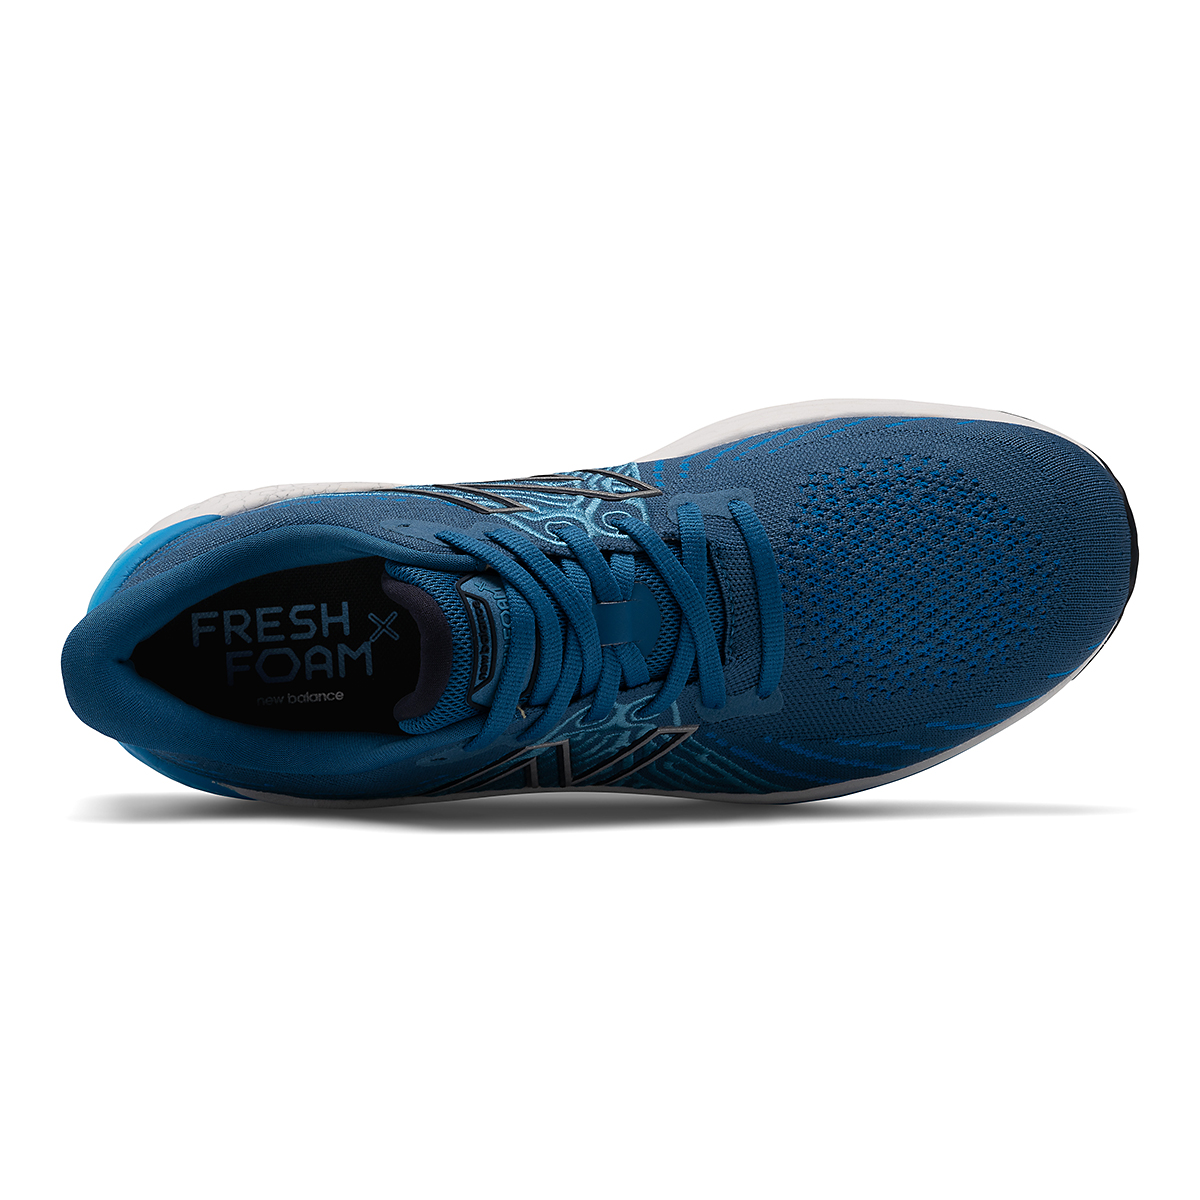 Men's New Balance Fresh Foam X Vongo V5 Running Shoe - Color: Oxygen Blue/Laser Blue - Size: 7 - Width: Wide, Oxygen Blue/Laser Blue, large, image 3